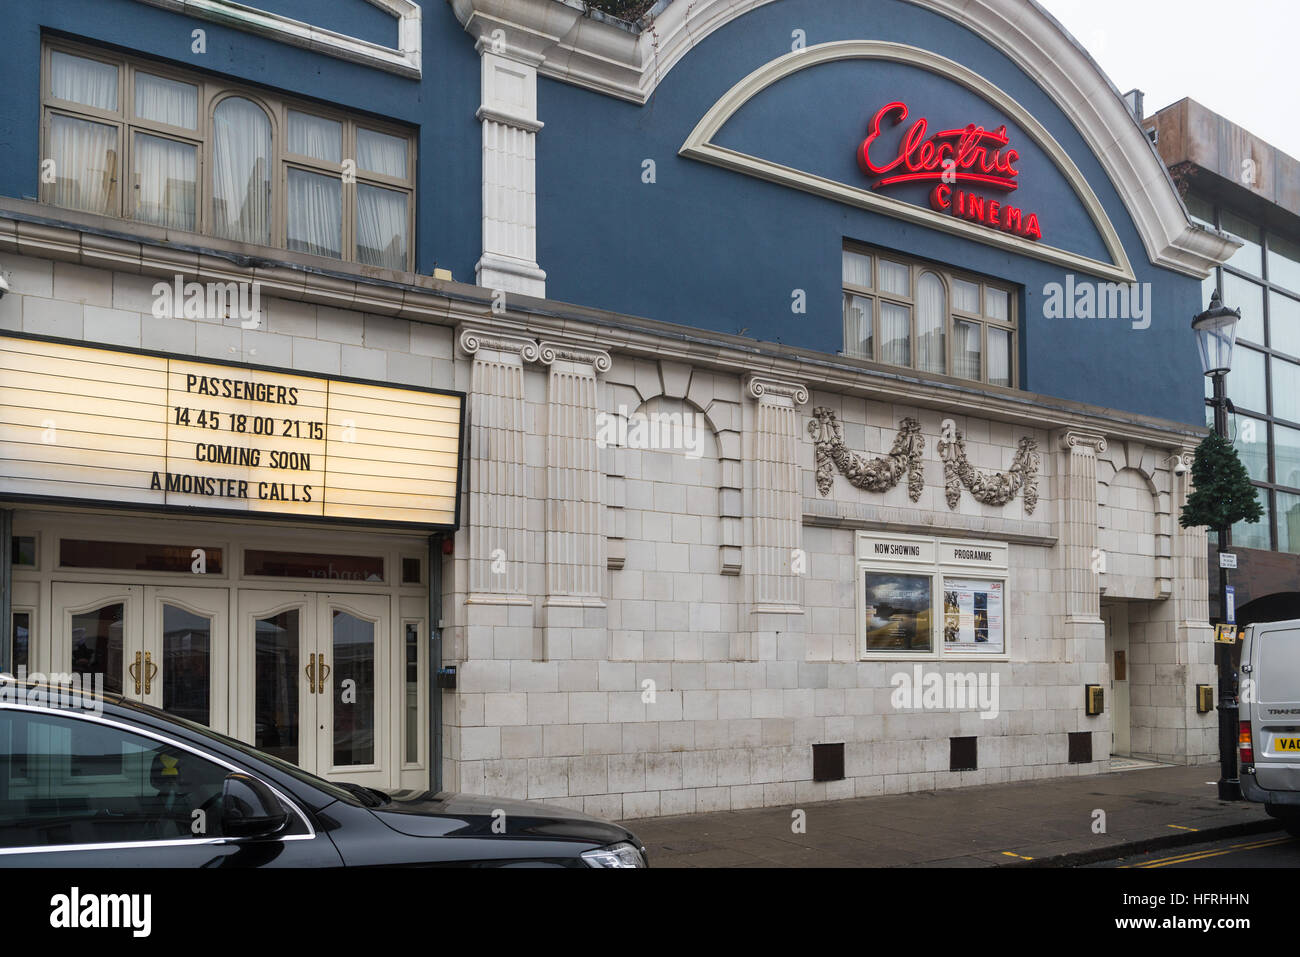 The Electric Cinema, Portobello Road, London, England. December 2016 - Stock Image